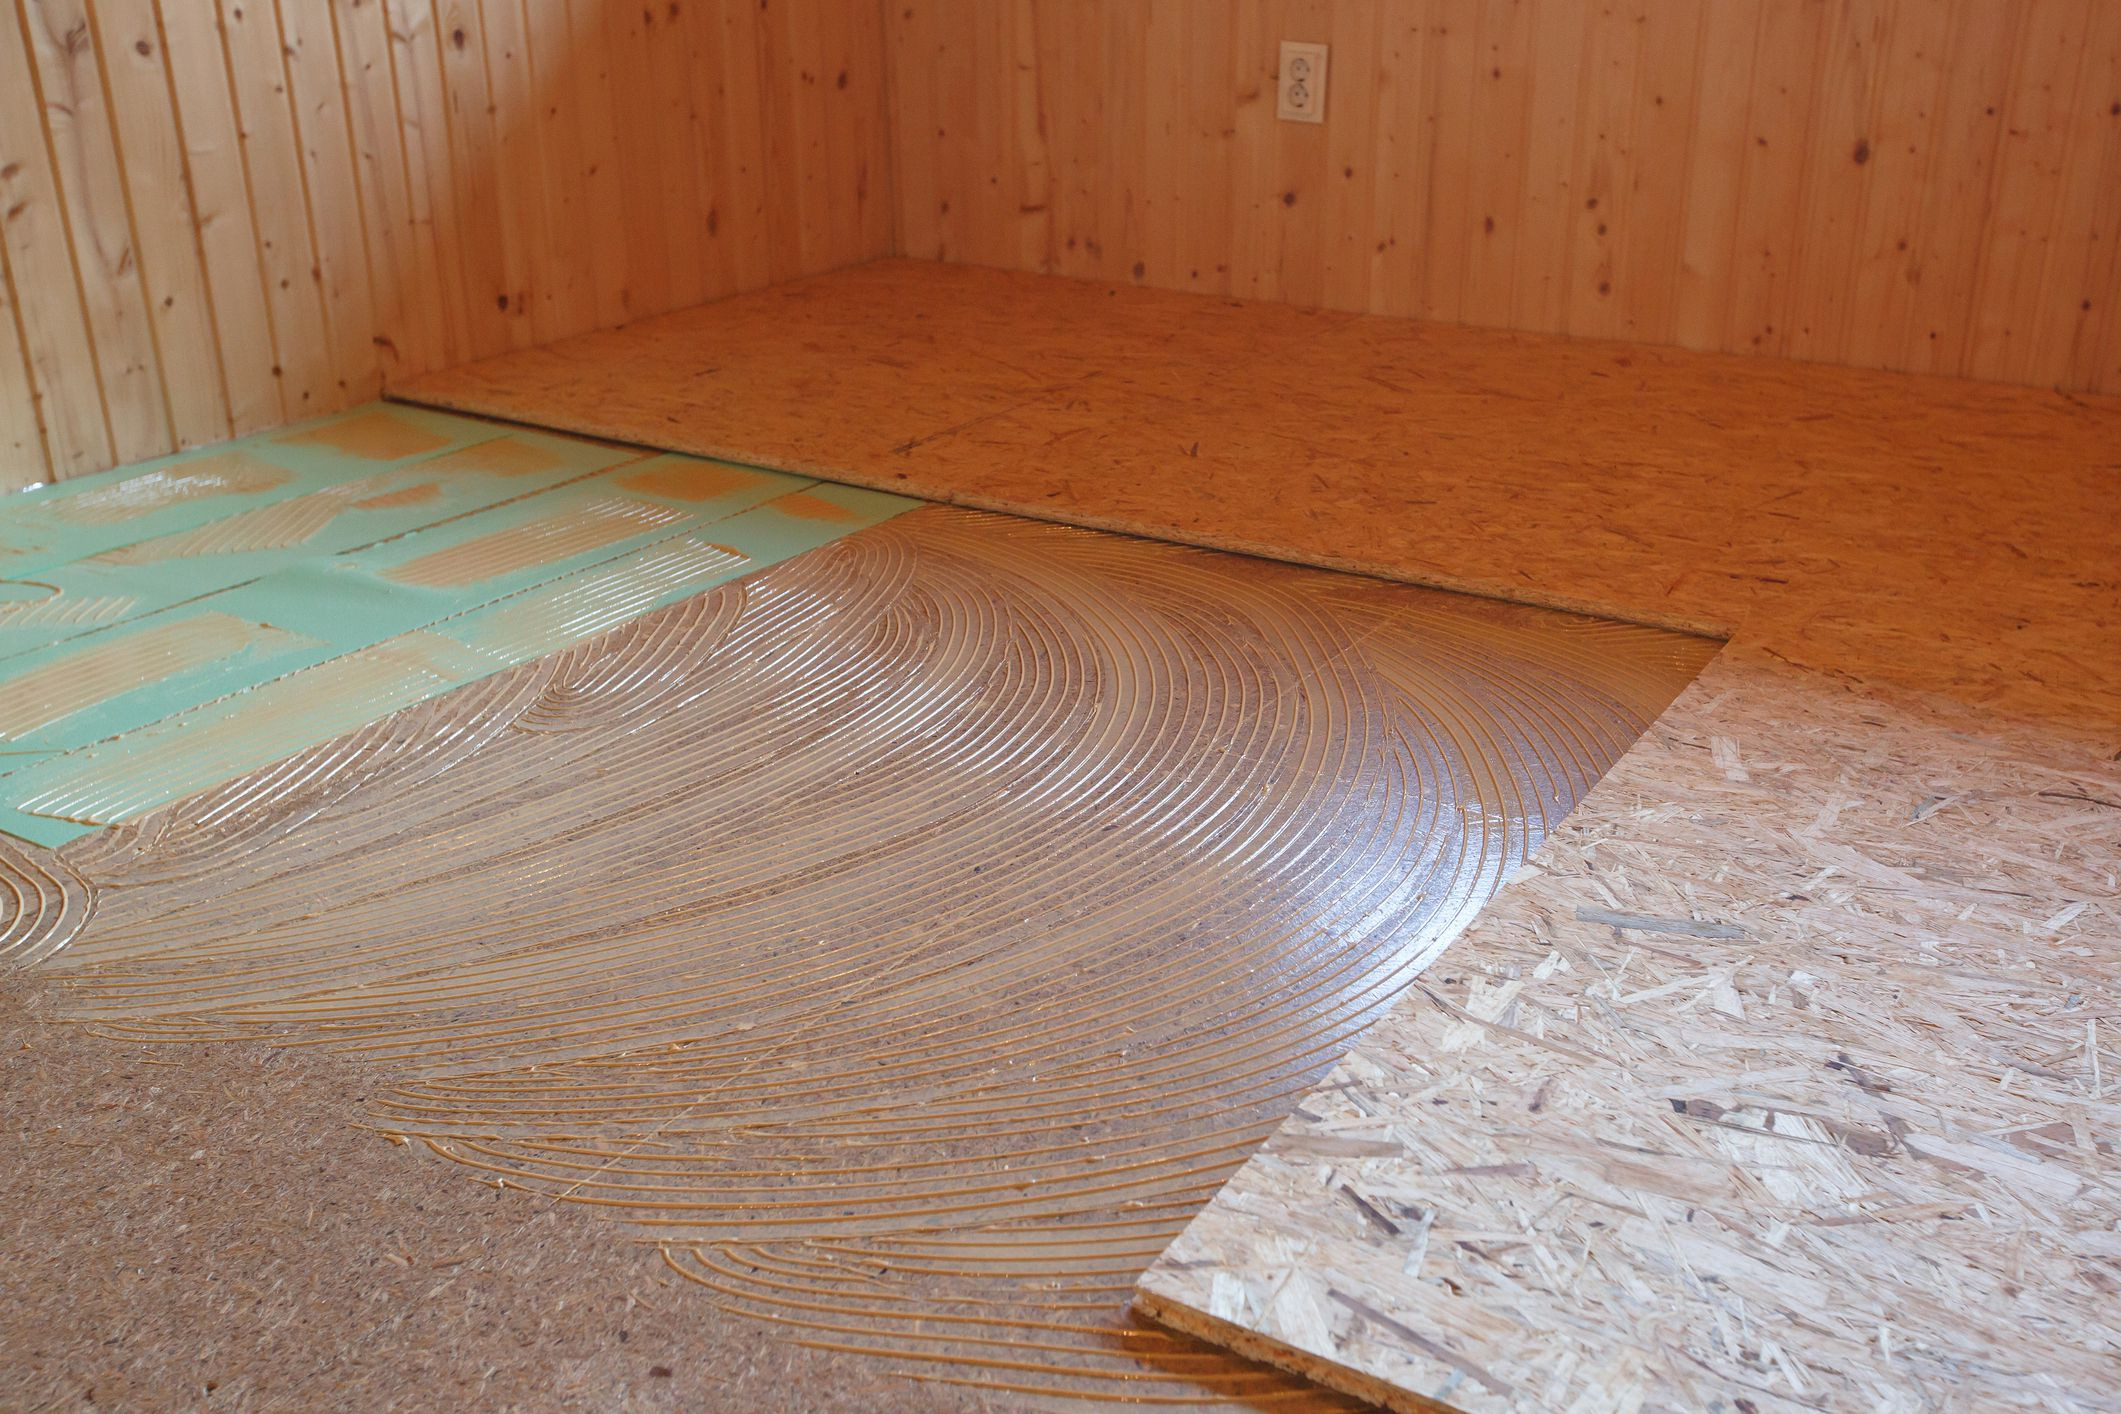 21 Fashionable Carpet In Bedrooms Vs Hardwood Flooring ...